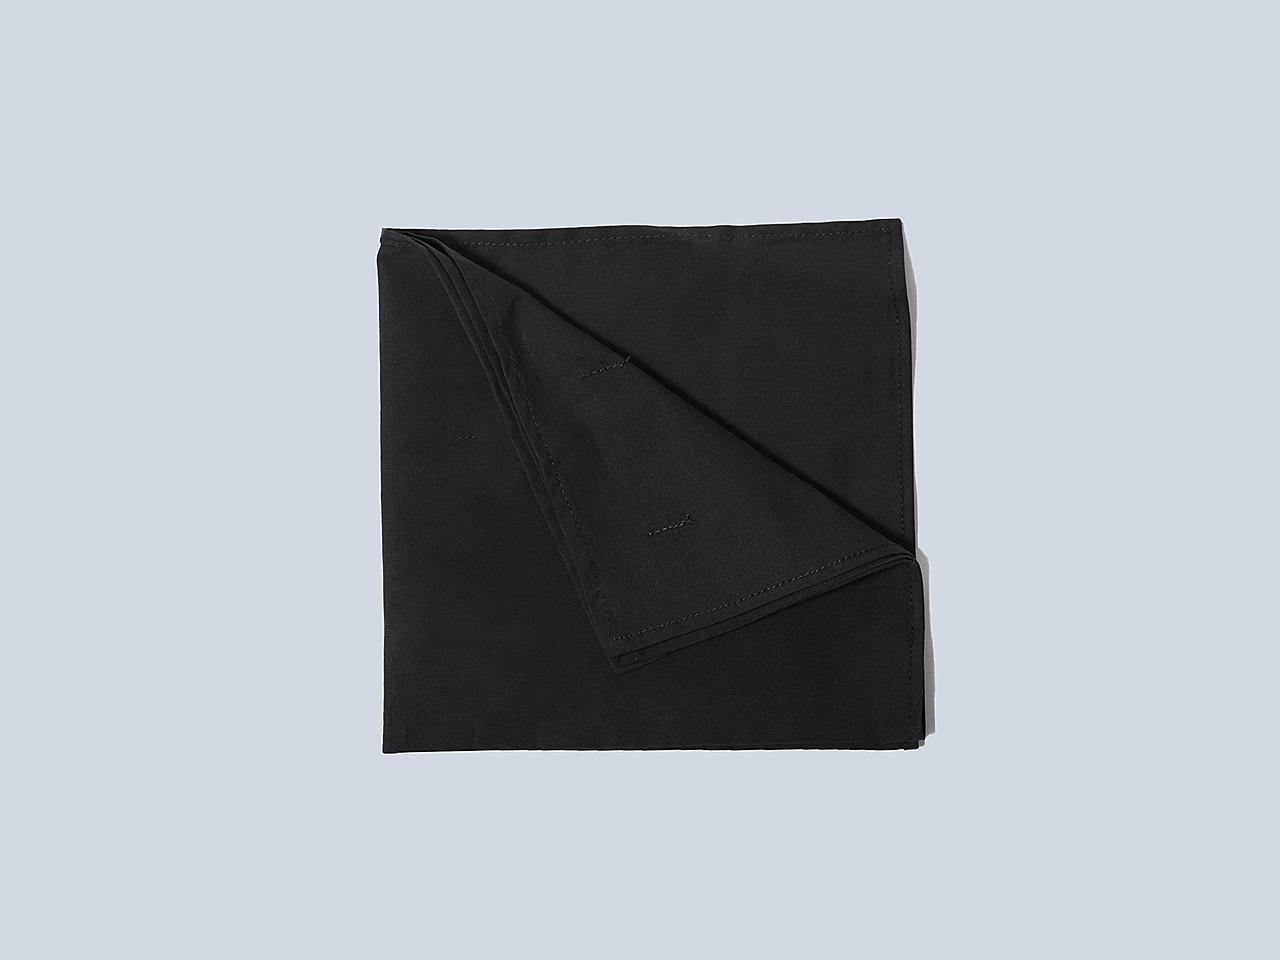 4f18670f97425 The Black Cotton Pocket Square   Product   Eph Apparel